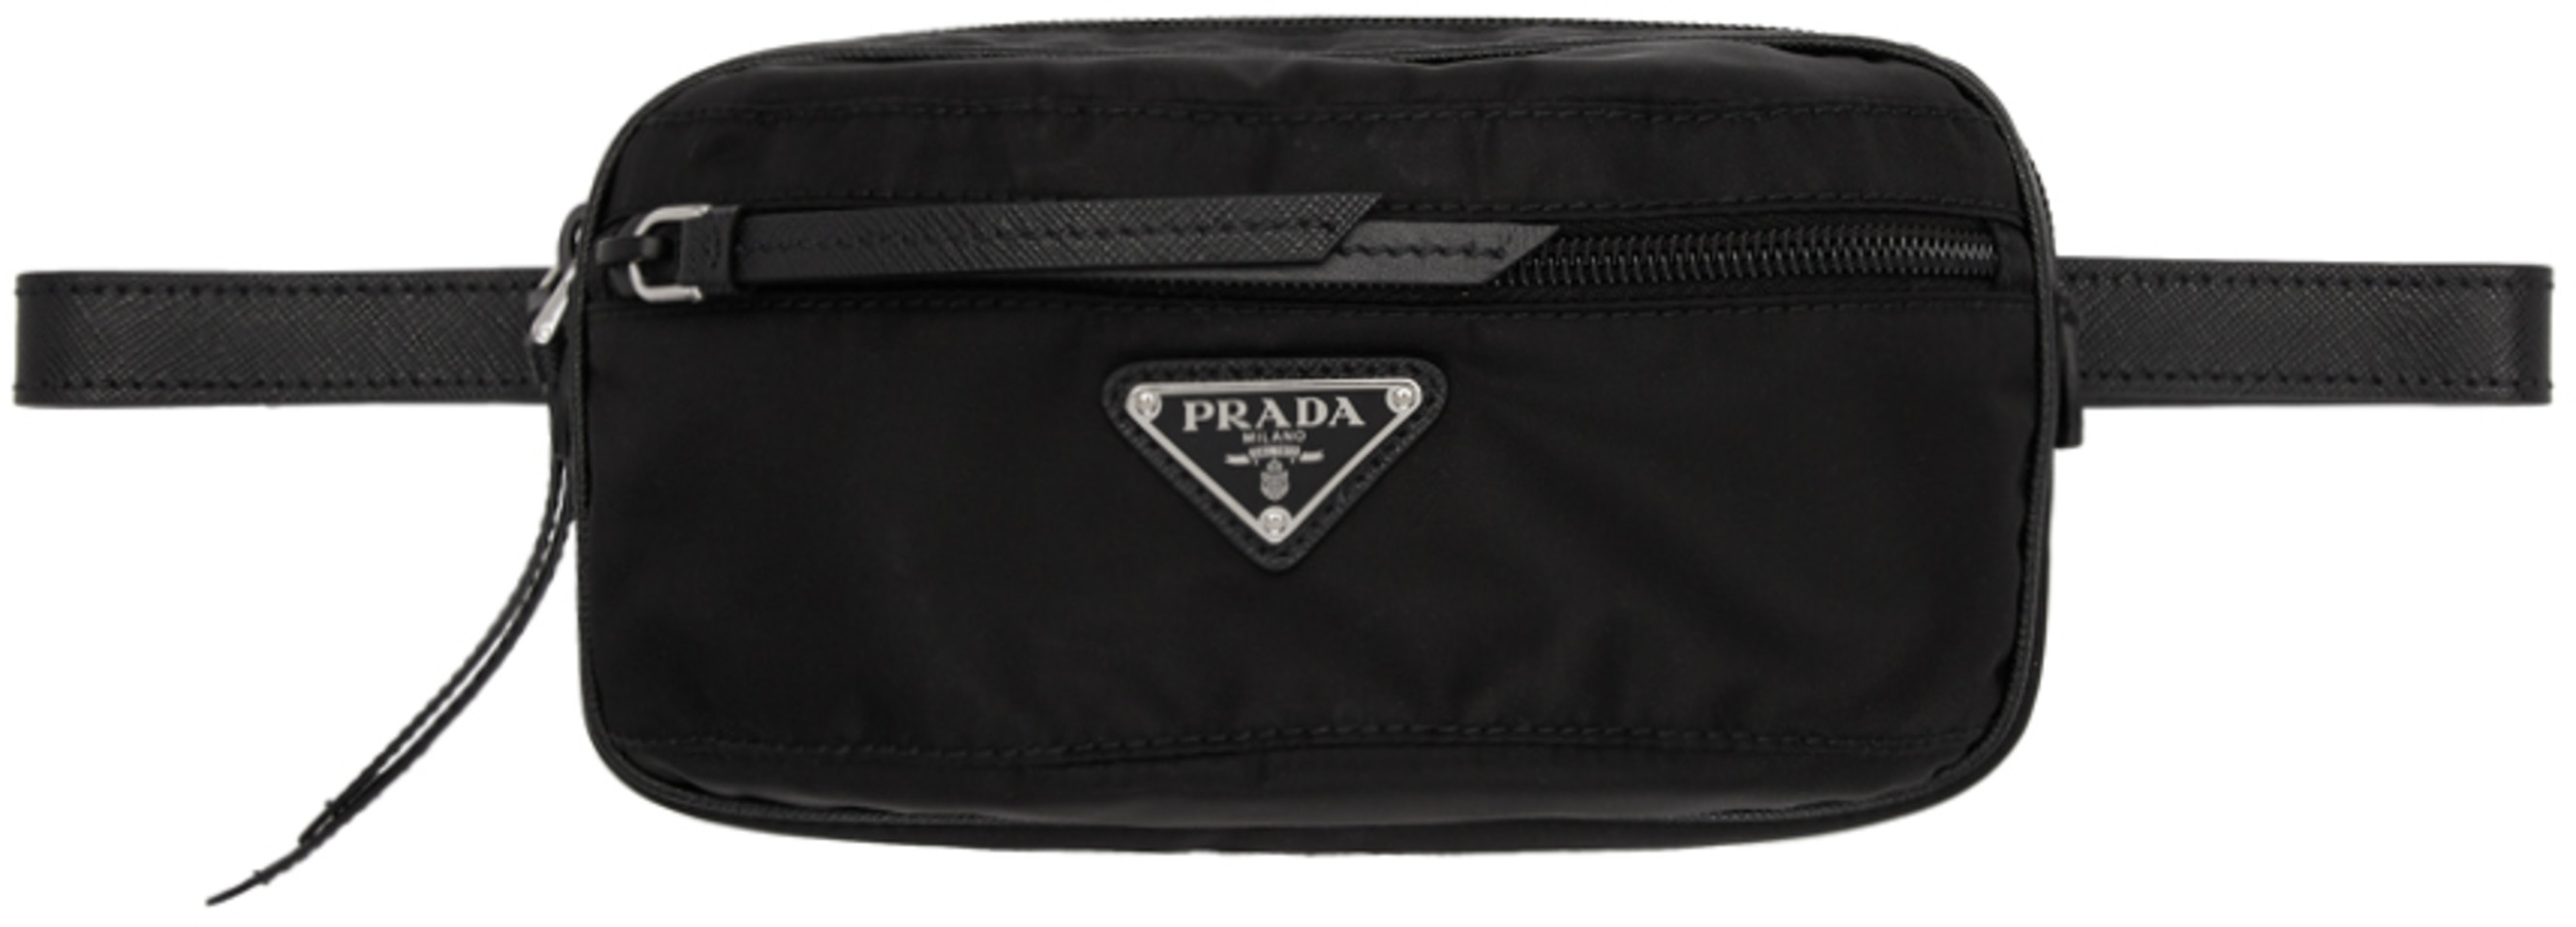 2e4427a620bf Designer pouches for Women | SSENSE Canada